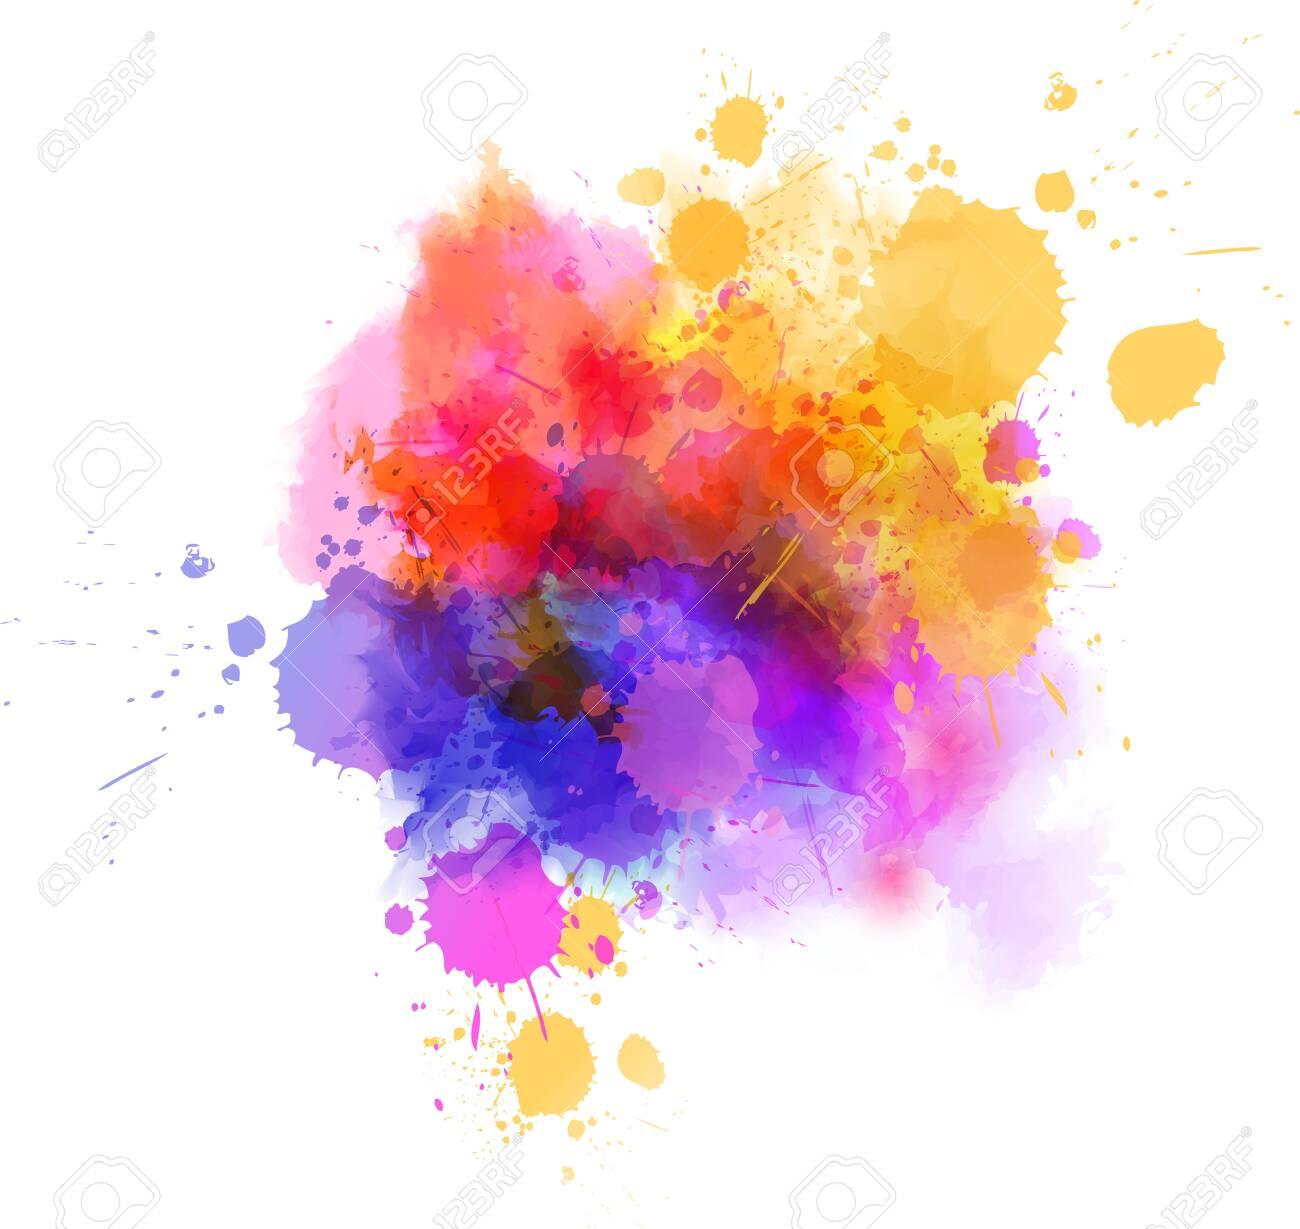 Multicolored splash watercolor paint blot - template for your designs. - 124462374